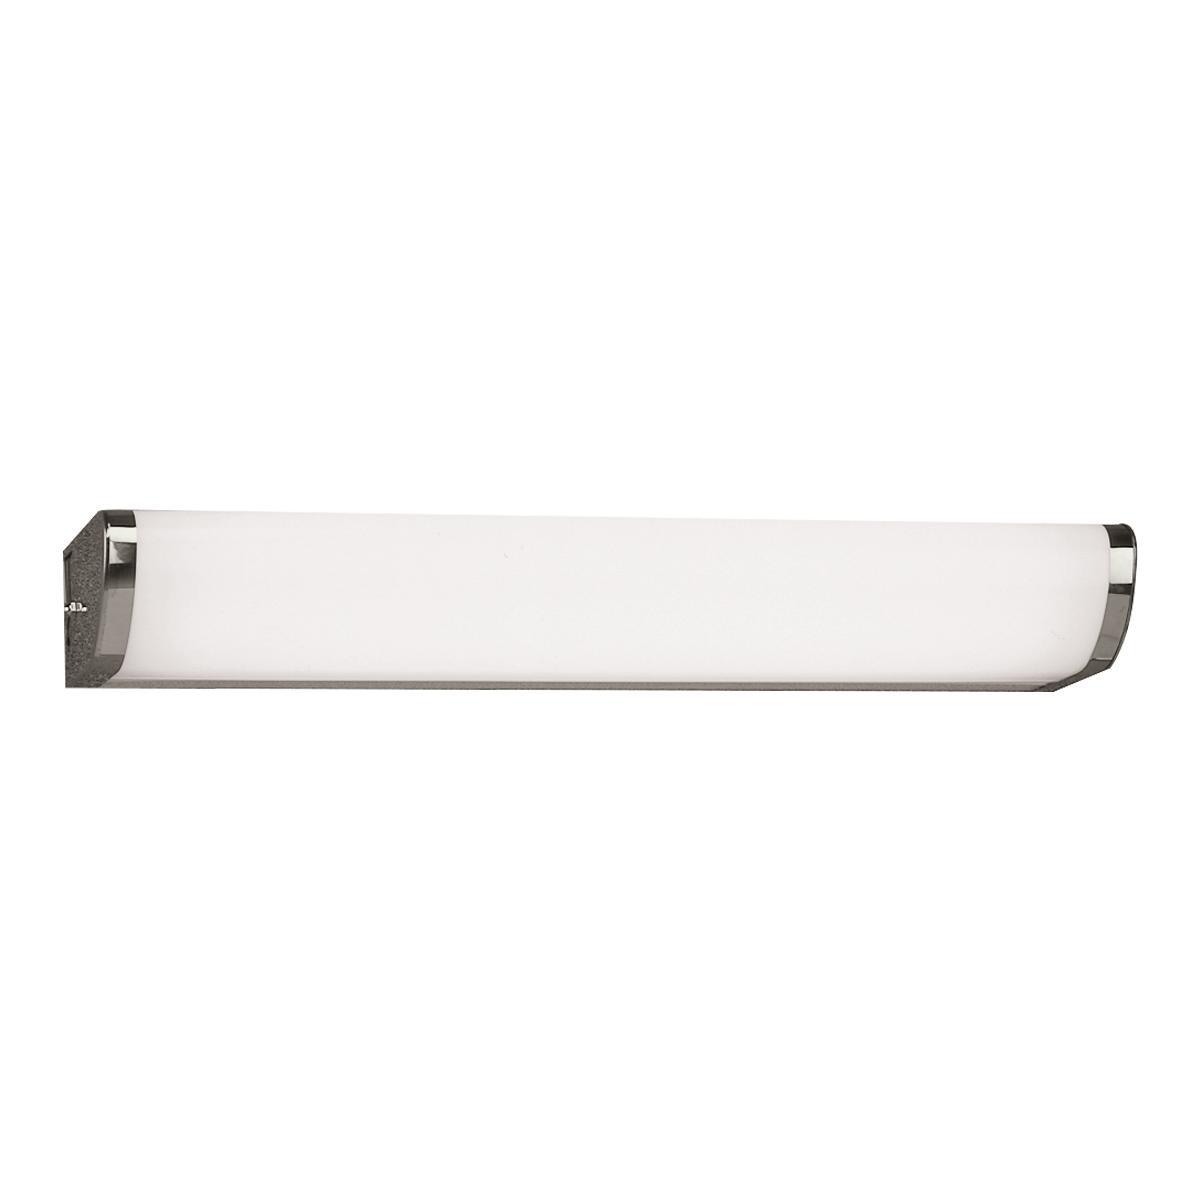 Chome (CEC) endcaps  sc 1 st  Brownlee Lighting - Fashionable u2022 Functional u2022 Affordable & Brownlee Lighting - Fashionable u2022 Functional u2022 Affordable